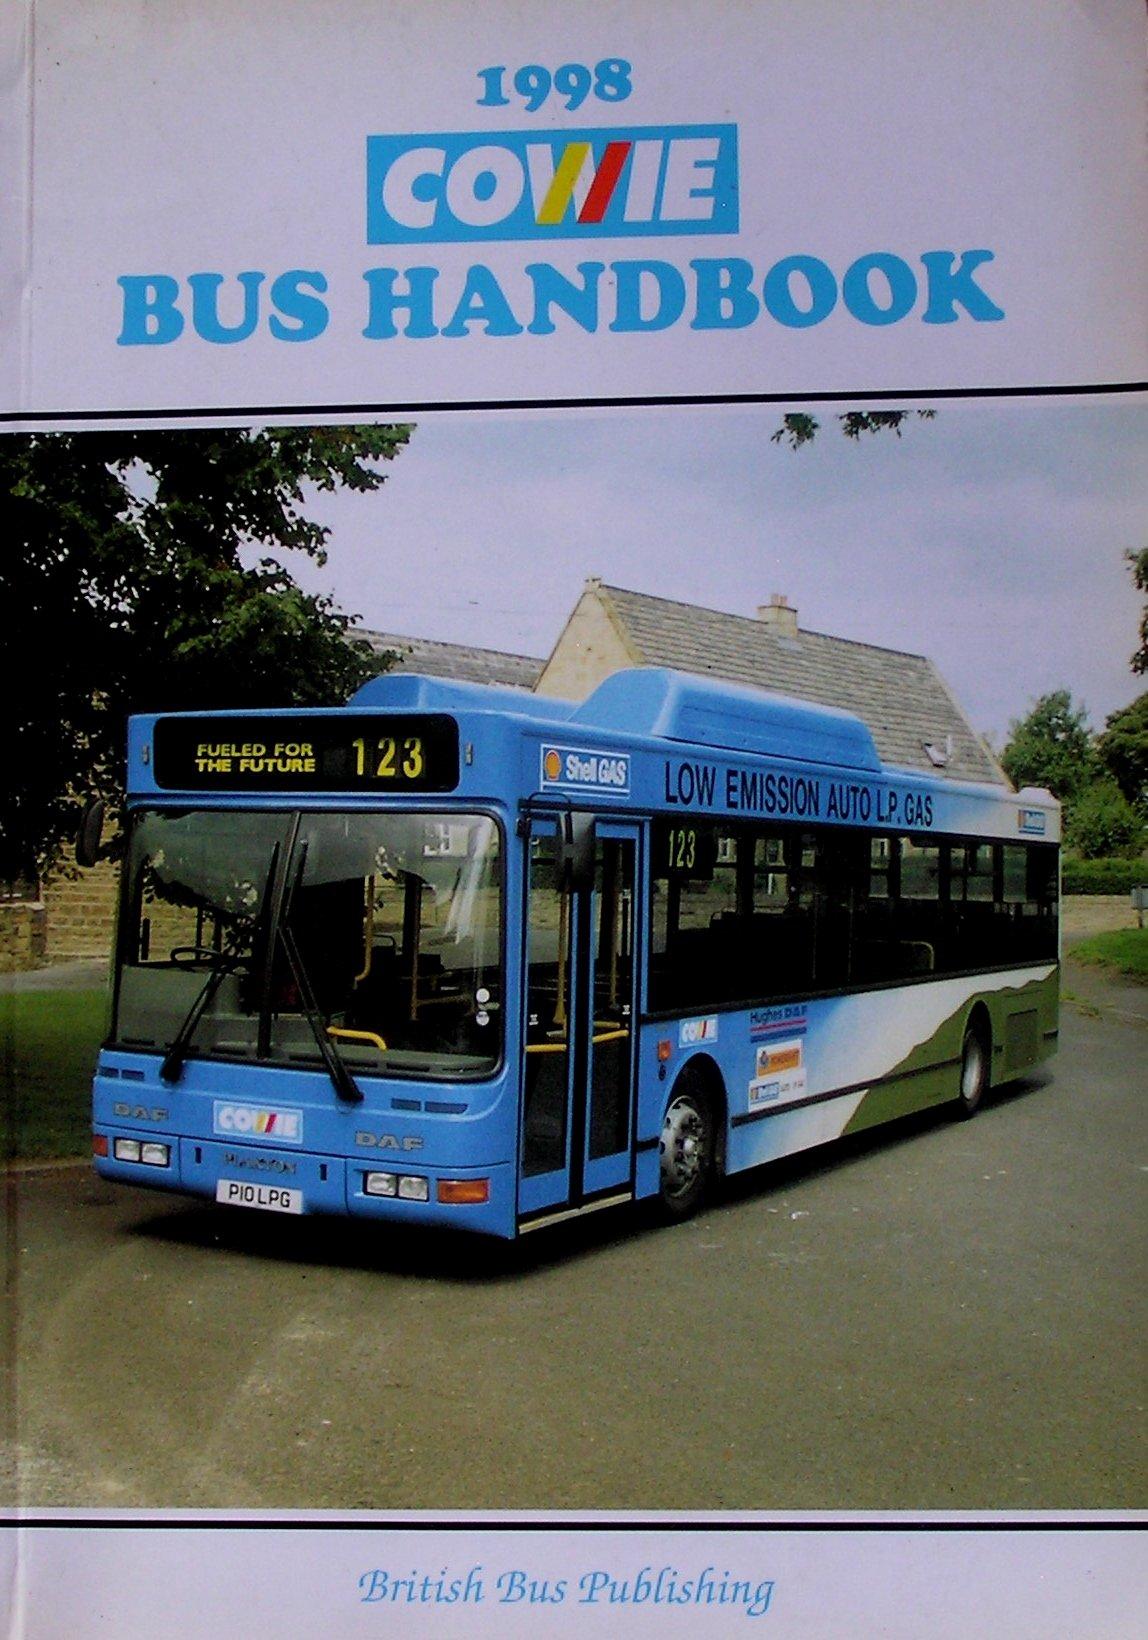 The Cowie Bus Handbook 1998 (Bus Handbooks)